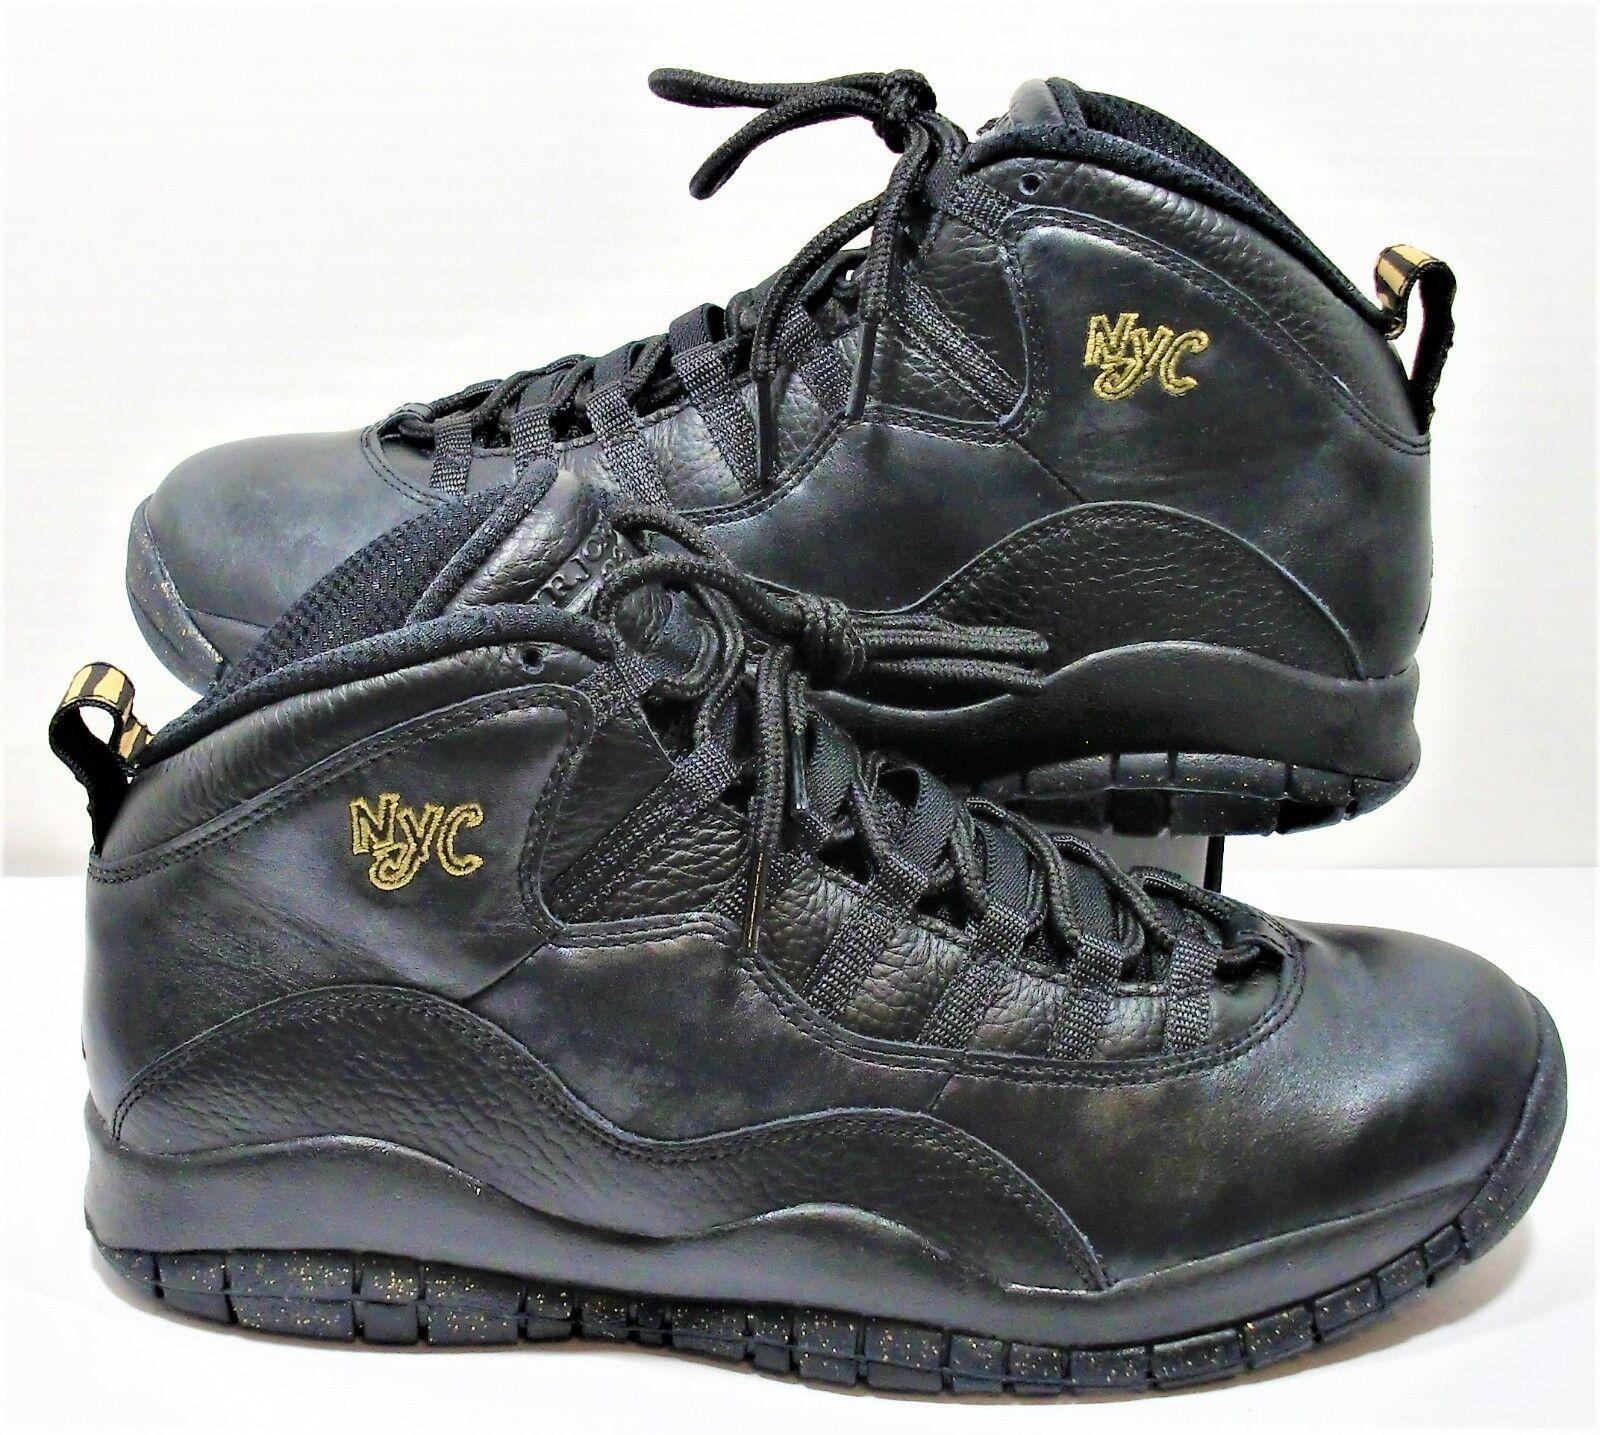 Nike air jordan x 10 vintage new york new york nero & gold uomini sz nuovi 310805 012